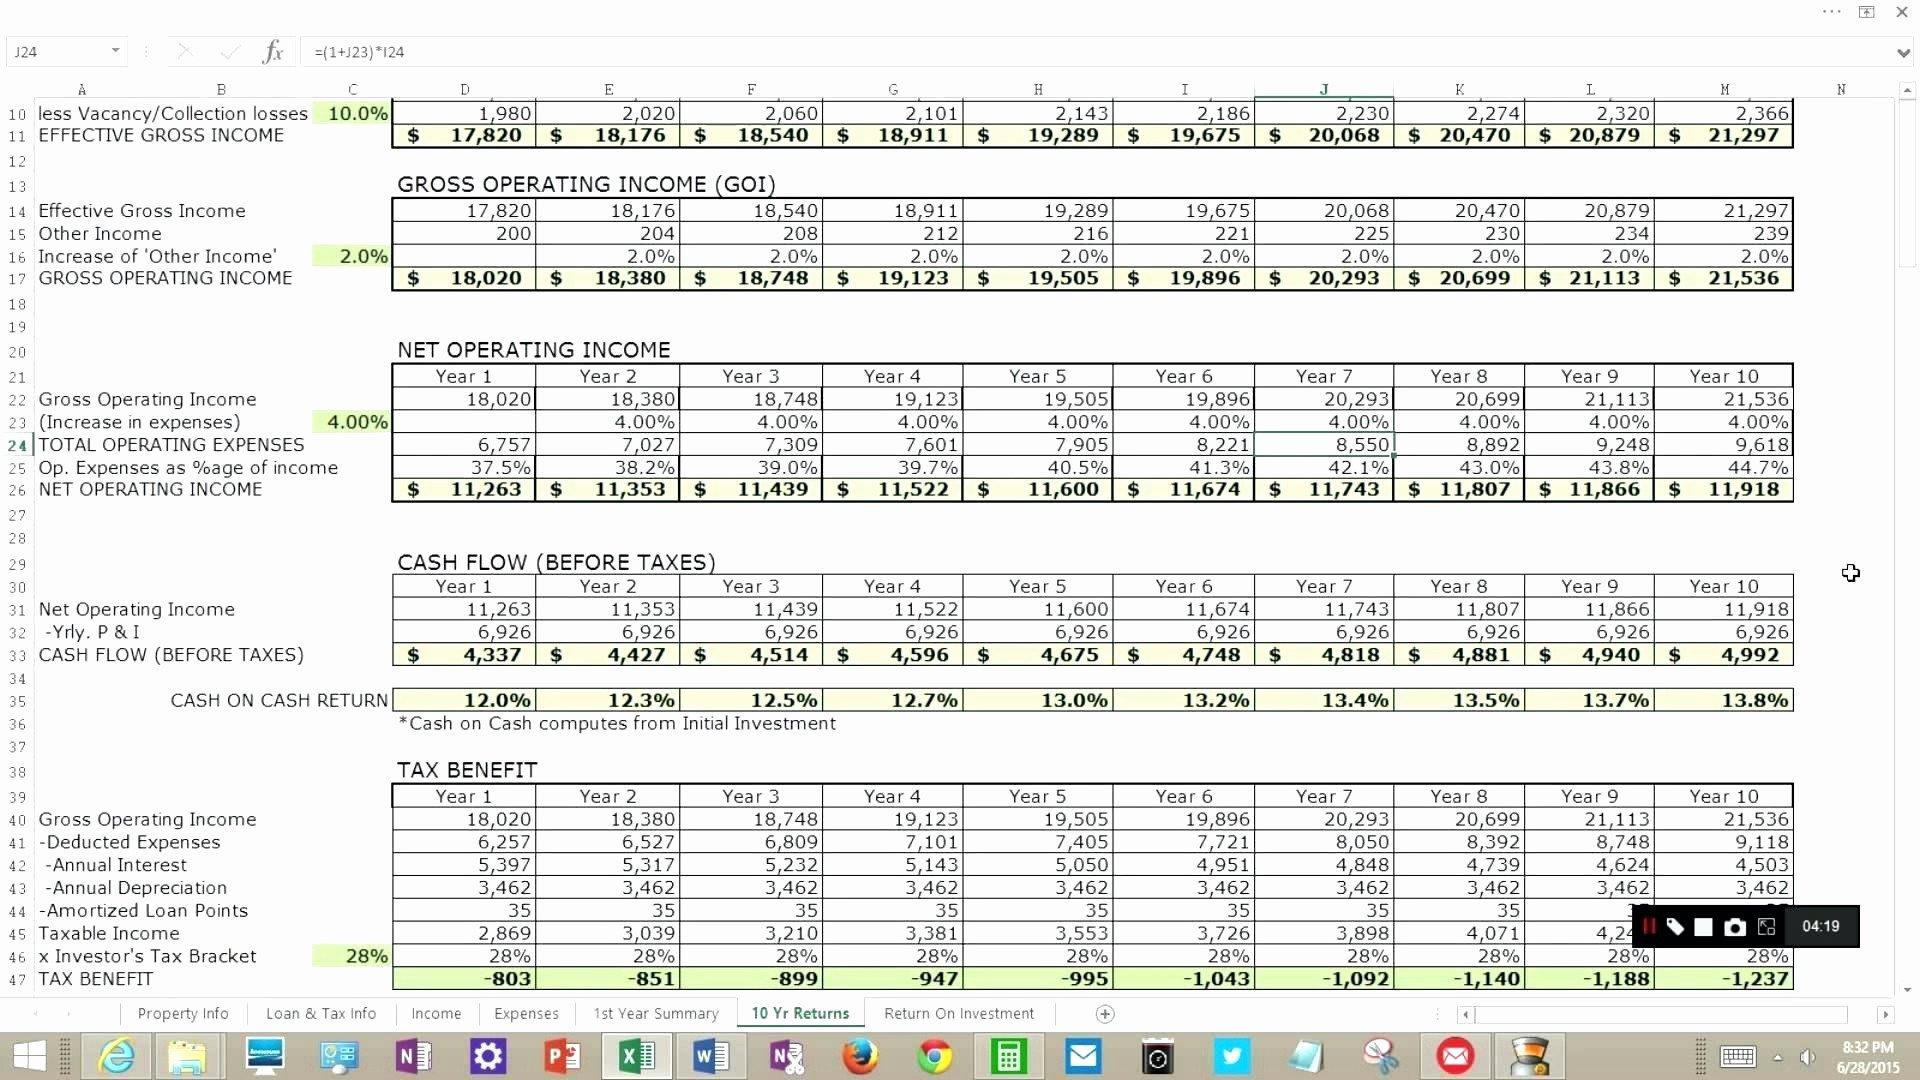 Sheet Pile Design Spreadsheet Or Cap Rate Spreadsheet Best 12 Luxury ... Intended For Cap Rate Spreadsheet